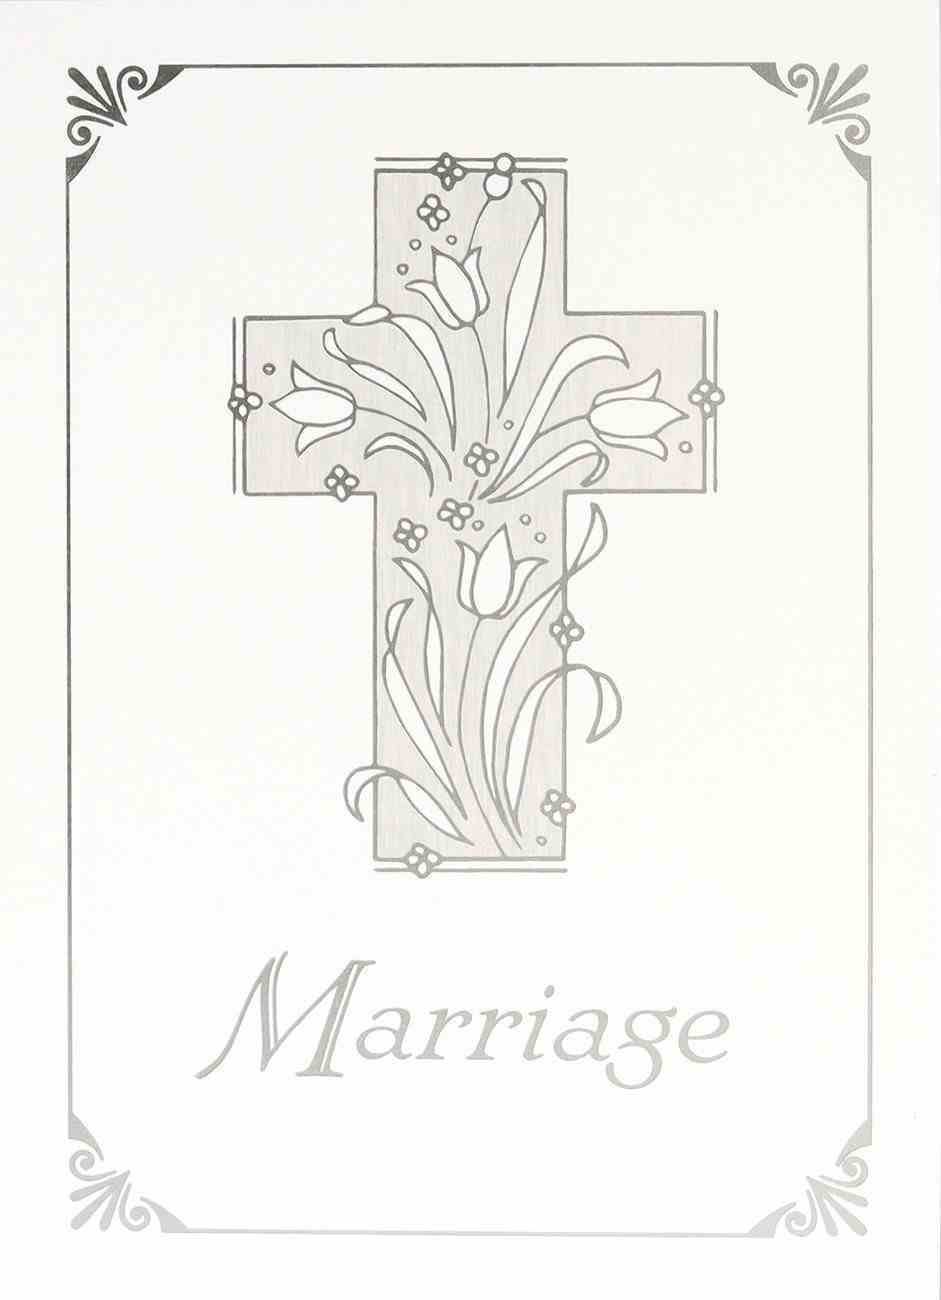 Certificate: Marriage, 1 John 4:17, Cross Silver-Foil Embossing (5x7in, .51 X 18.03 X 13.21cm) Stationery